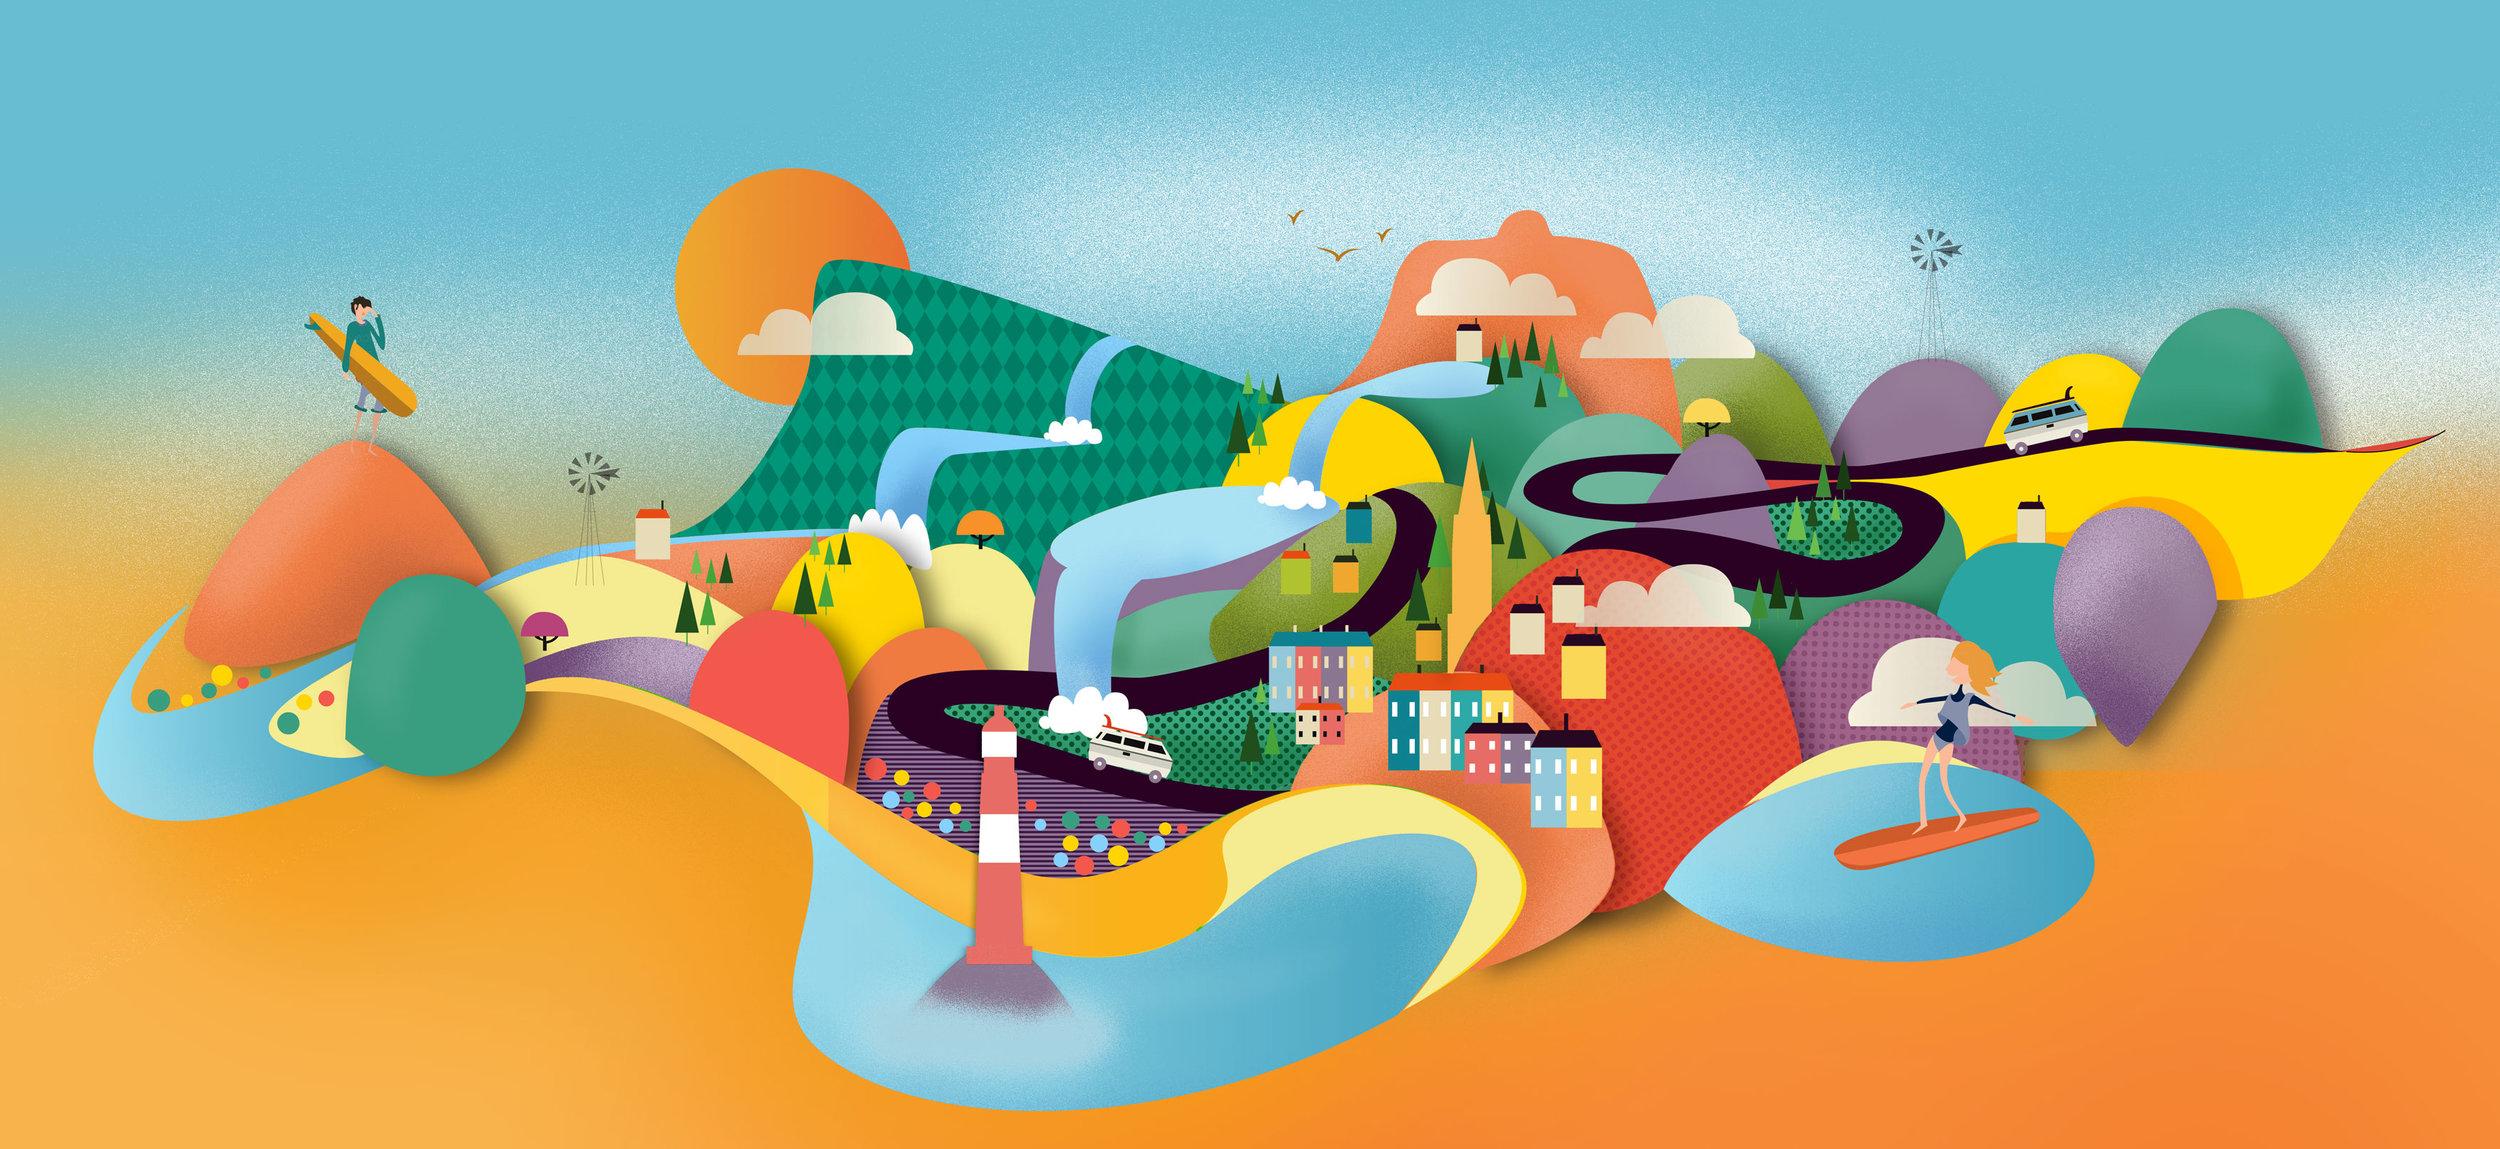 Reddin-designs-illustrated-hero-image-1.jpg